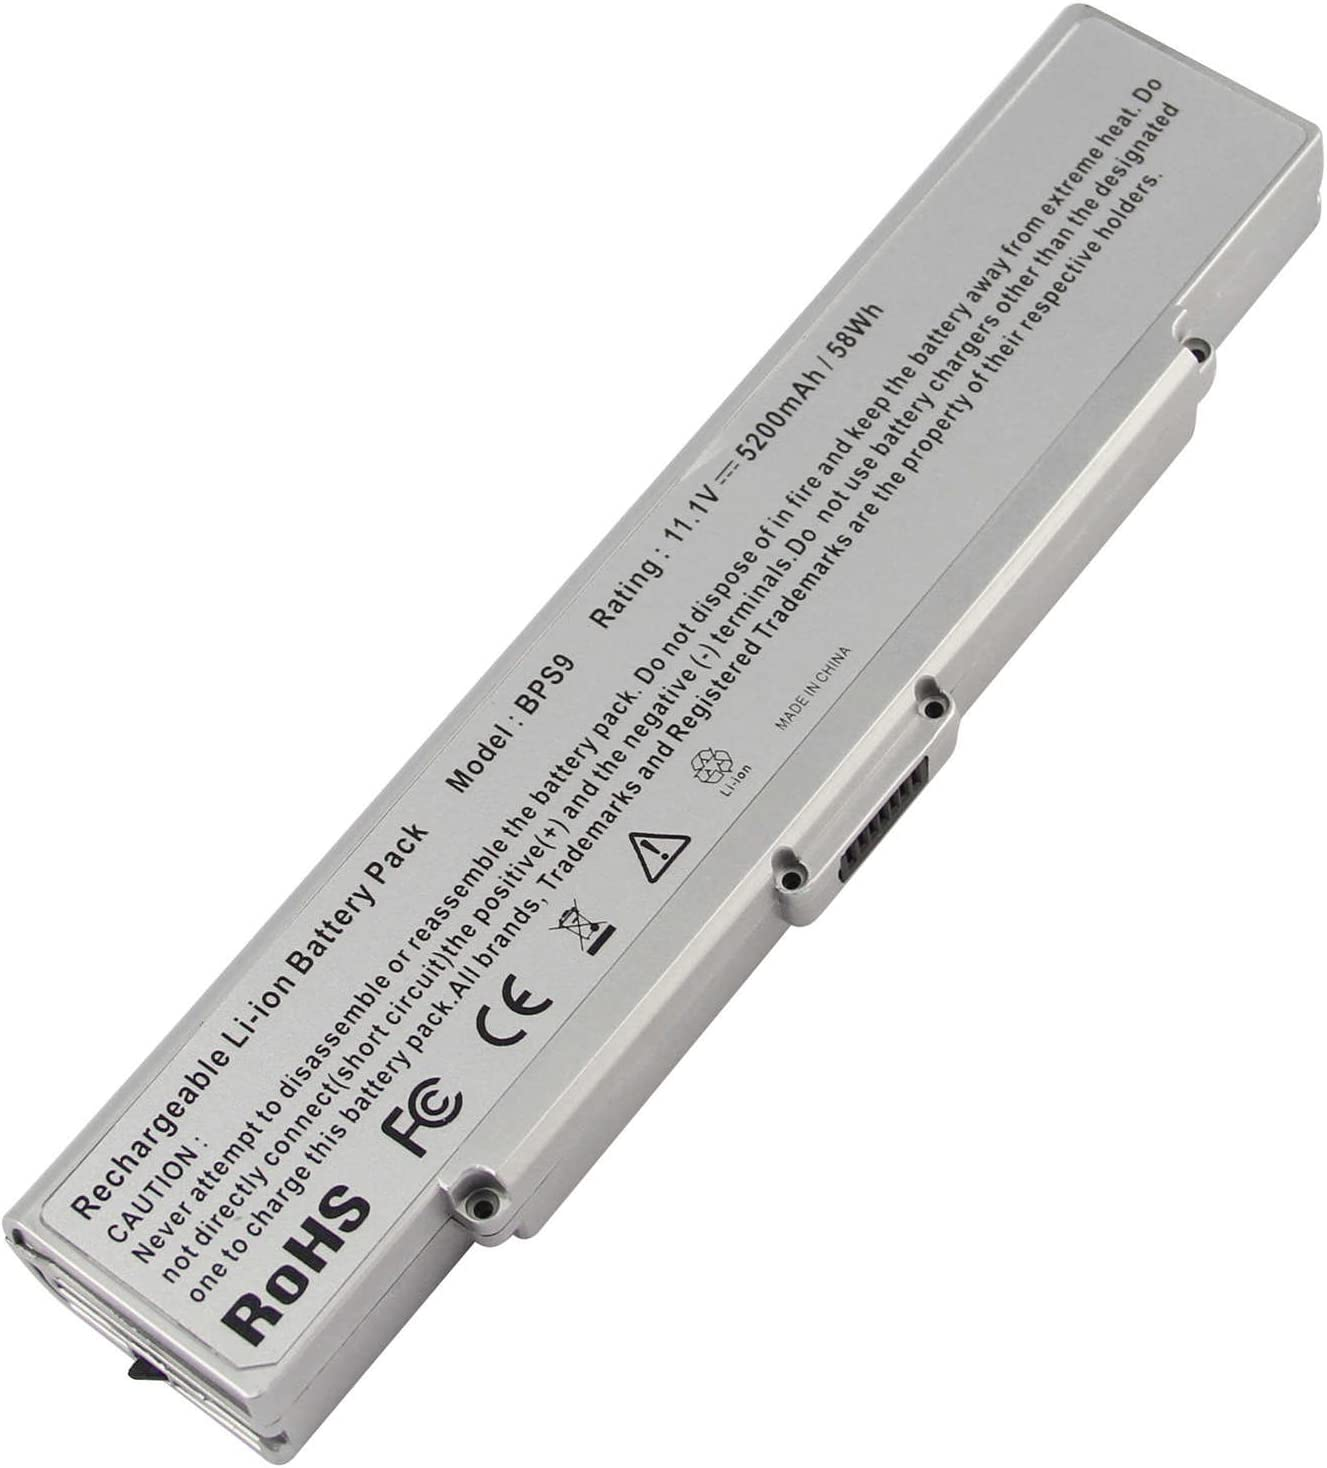 Fancy Buying Laptop Battery for Sony VAIO PCG VGN-AR VGN-NR VGN-SZ VGN-CR Series, fits P/N BPS9 VGP-BPL9 VGP-BPS9 VGP-BPS9/B VGP-BPS9/S VGP-BPS9A VGP-BPS9A/B (Silver 11.1V 5200mAh)